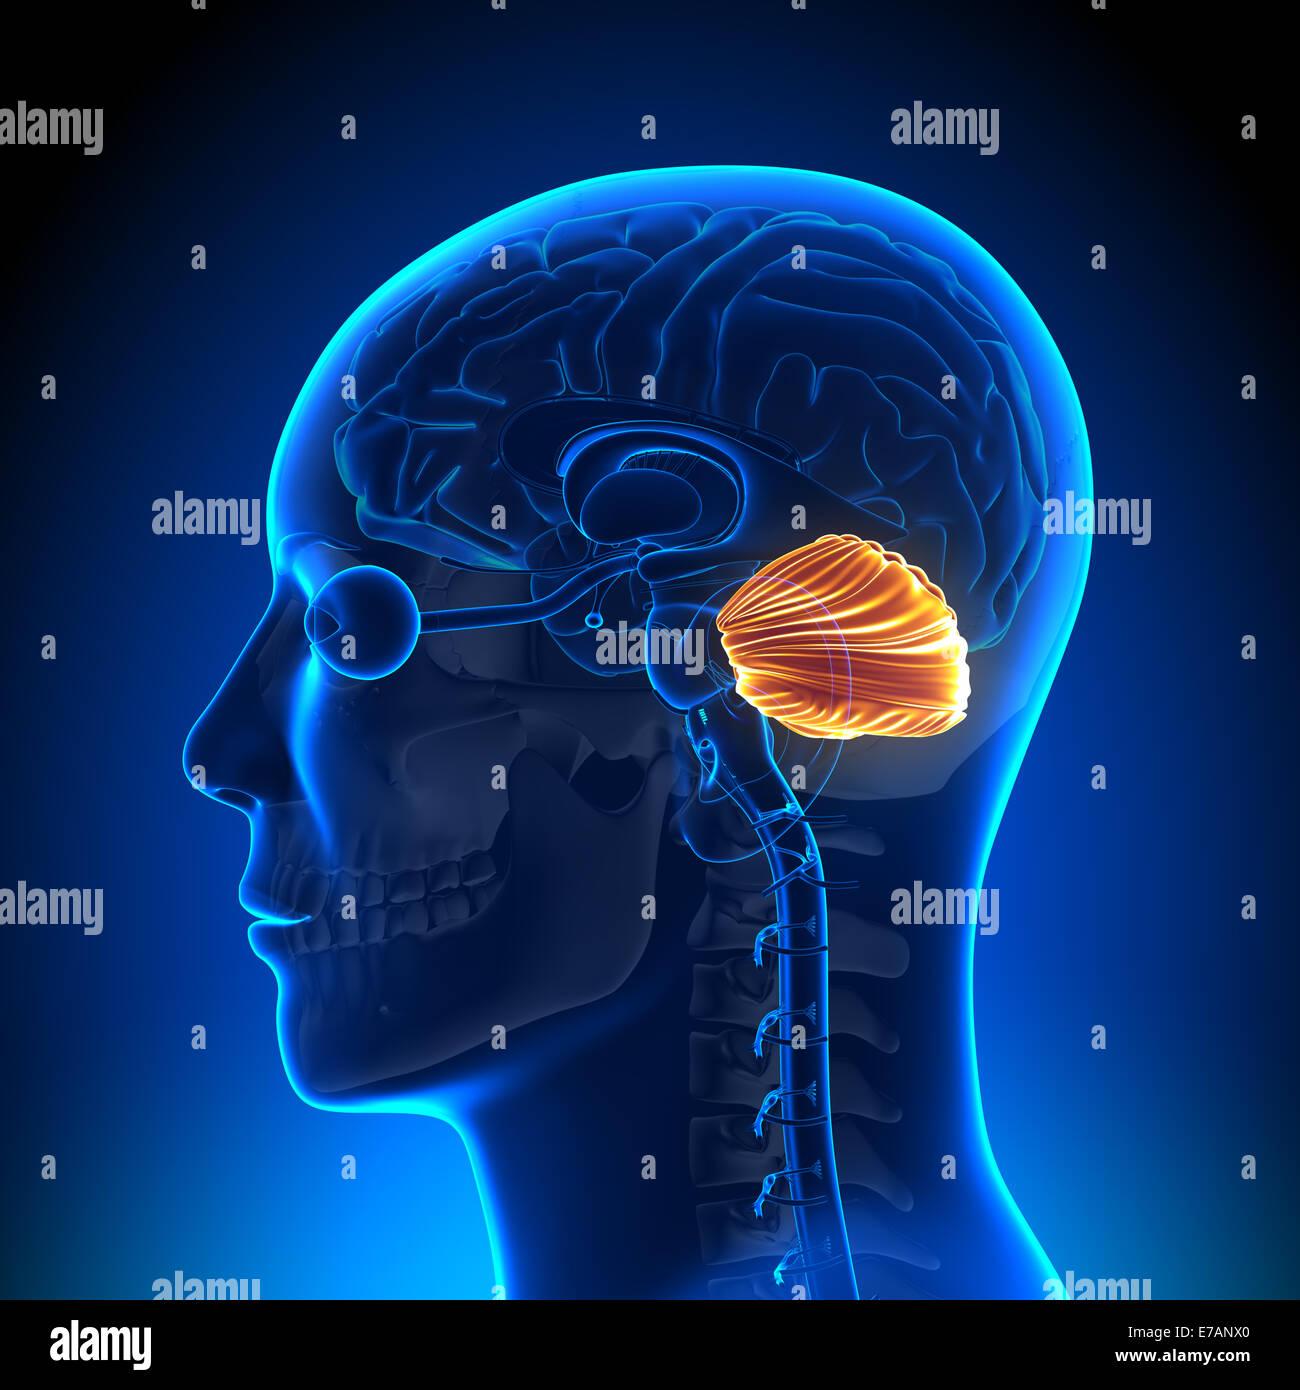 Cerebellum - Brain Anatomy - Stock Image